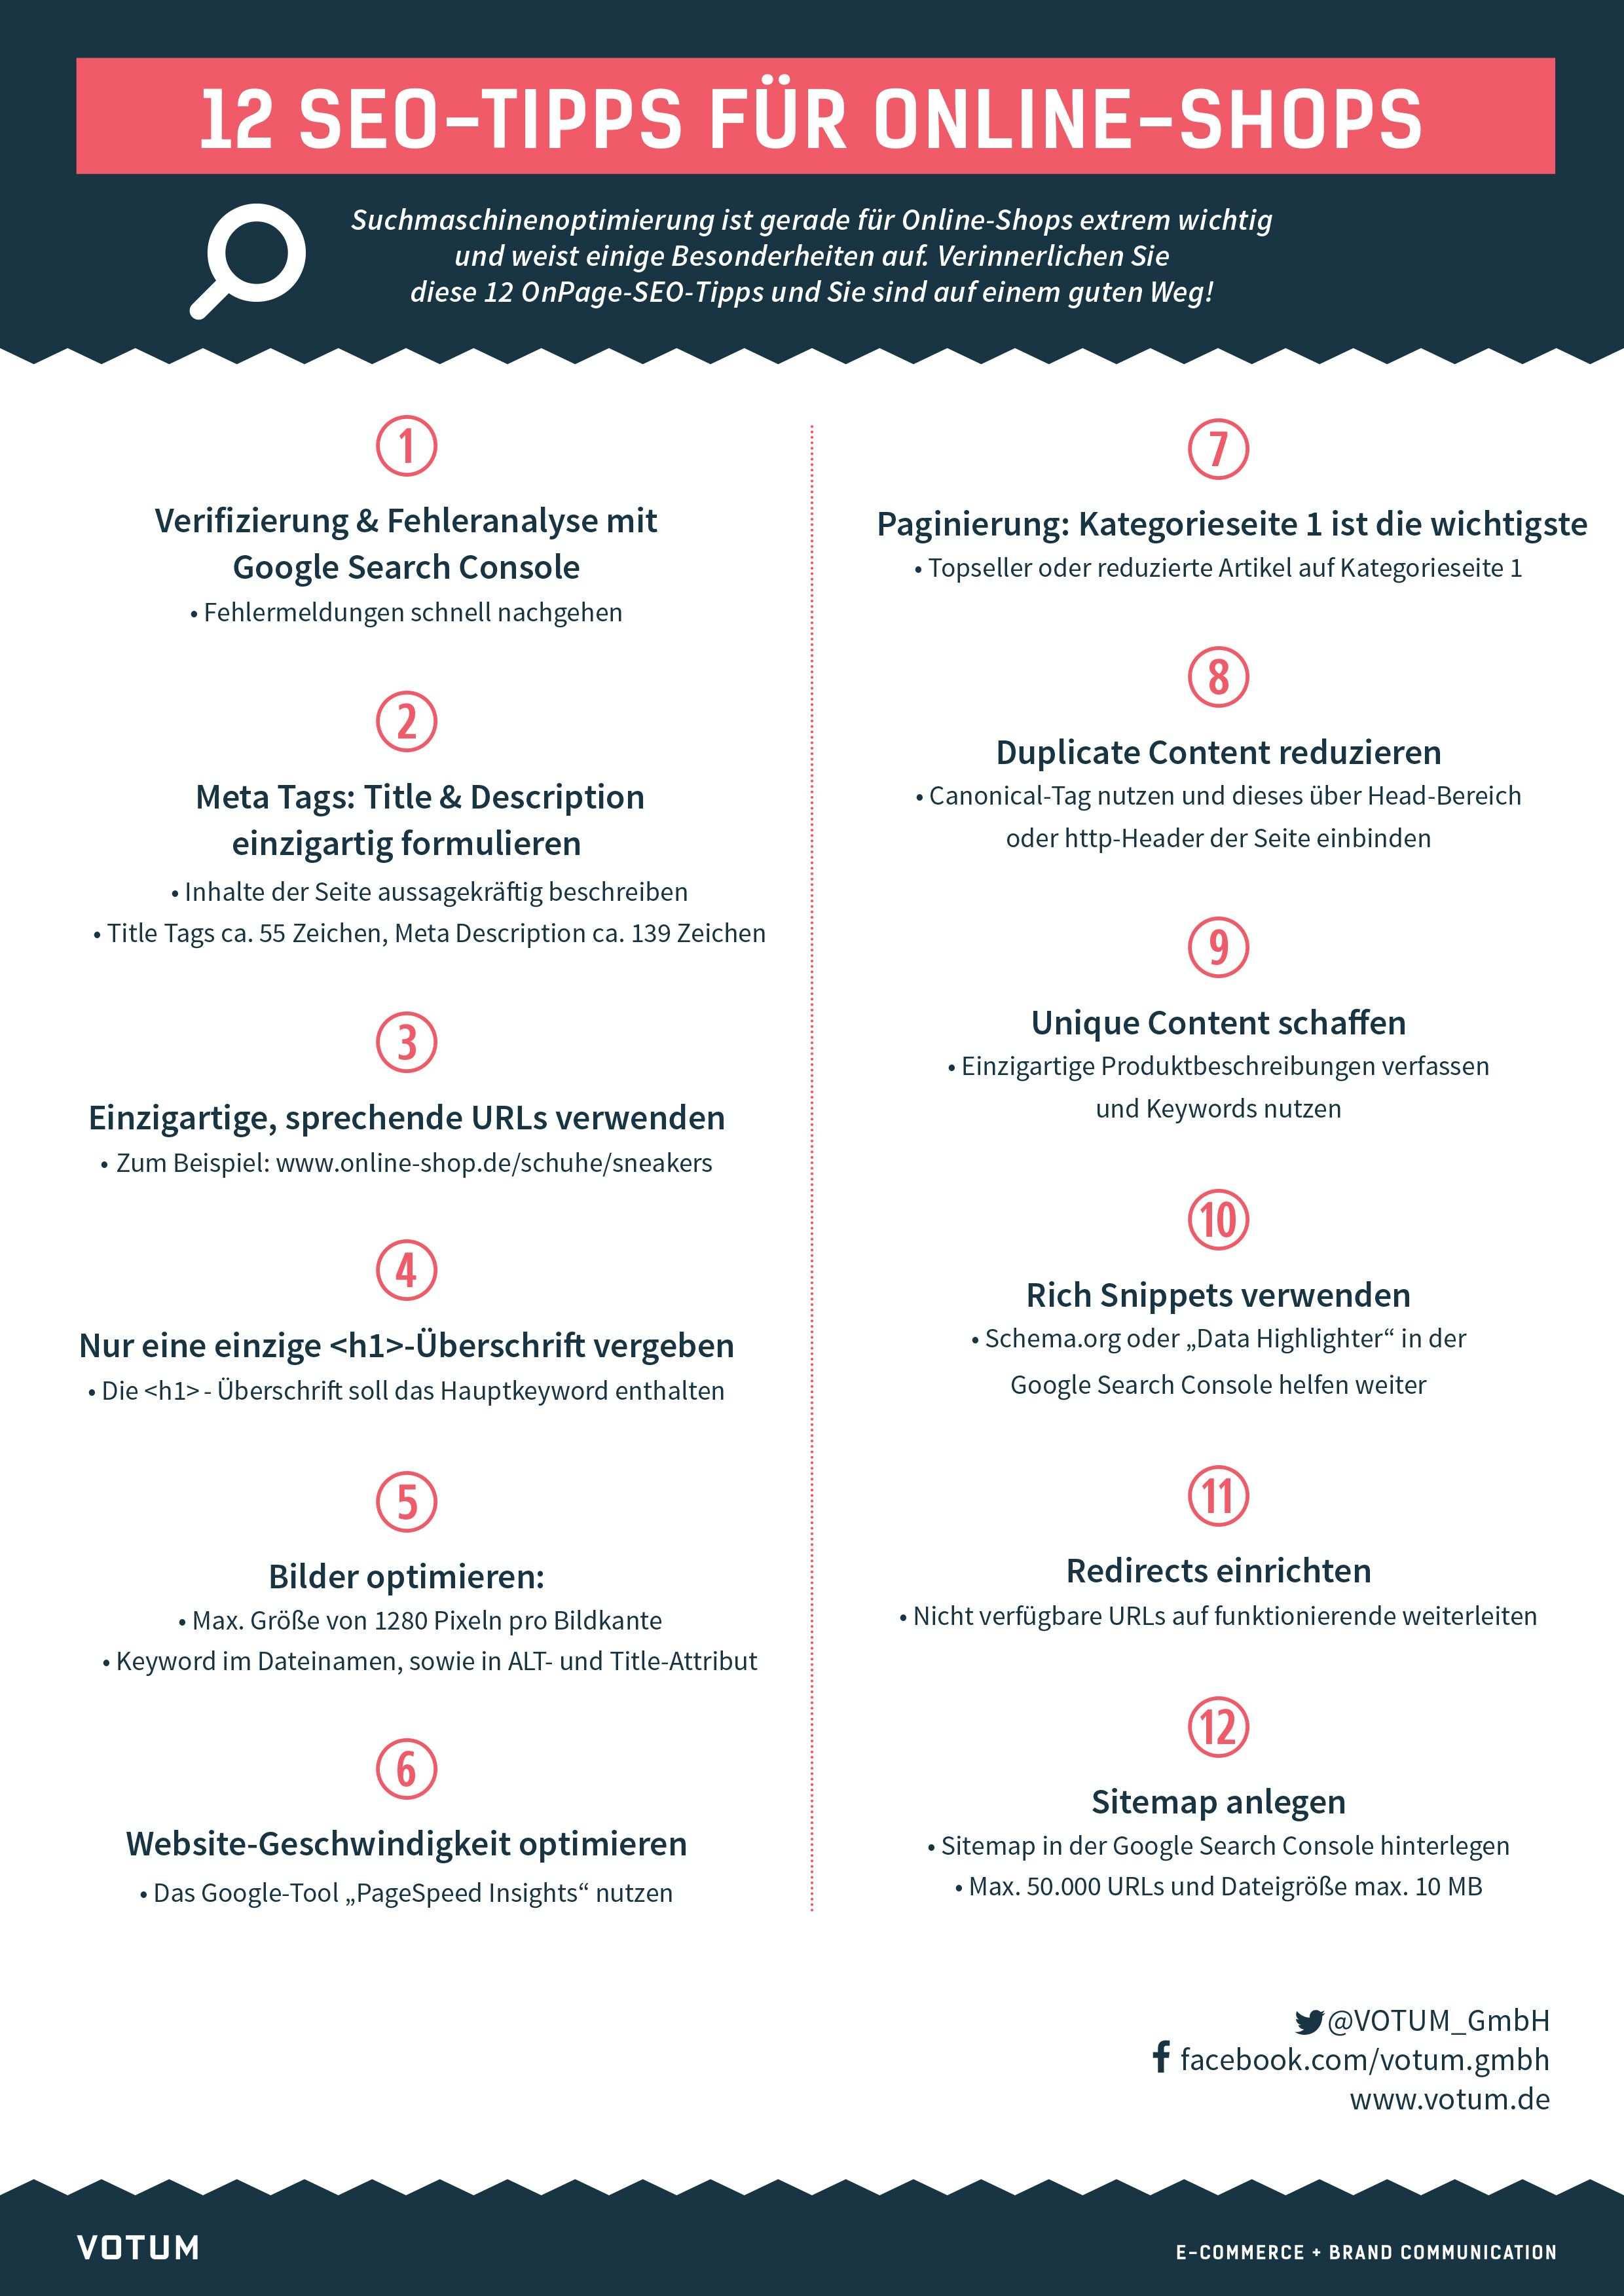 12 Seo Tipps Fur Online Shops Zum Download Votum De Seo Tipps Infografik Suchmaschinenoptimierung